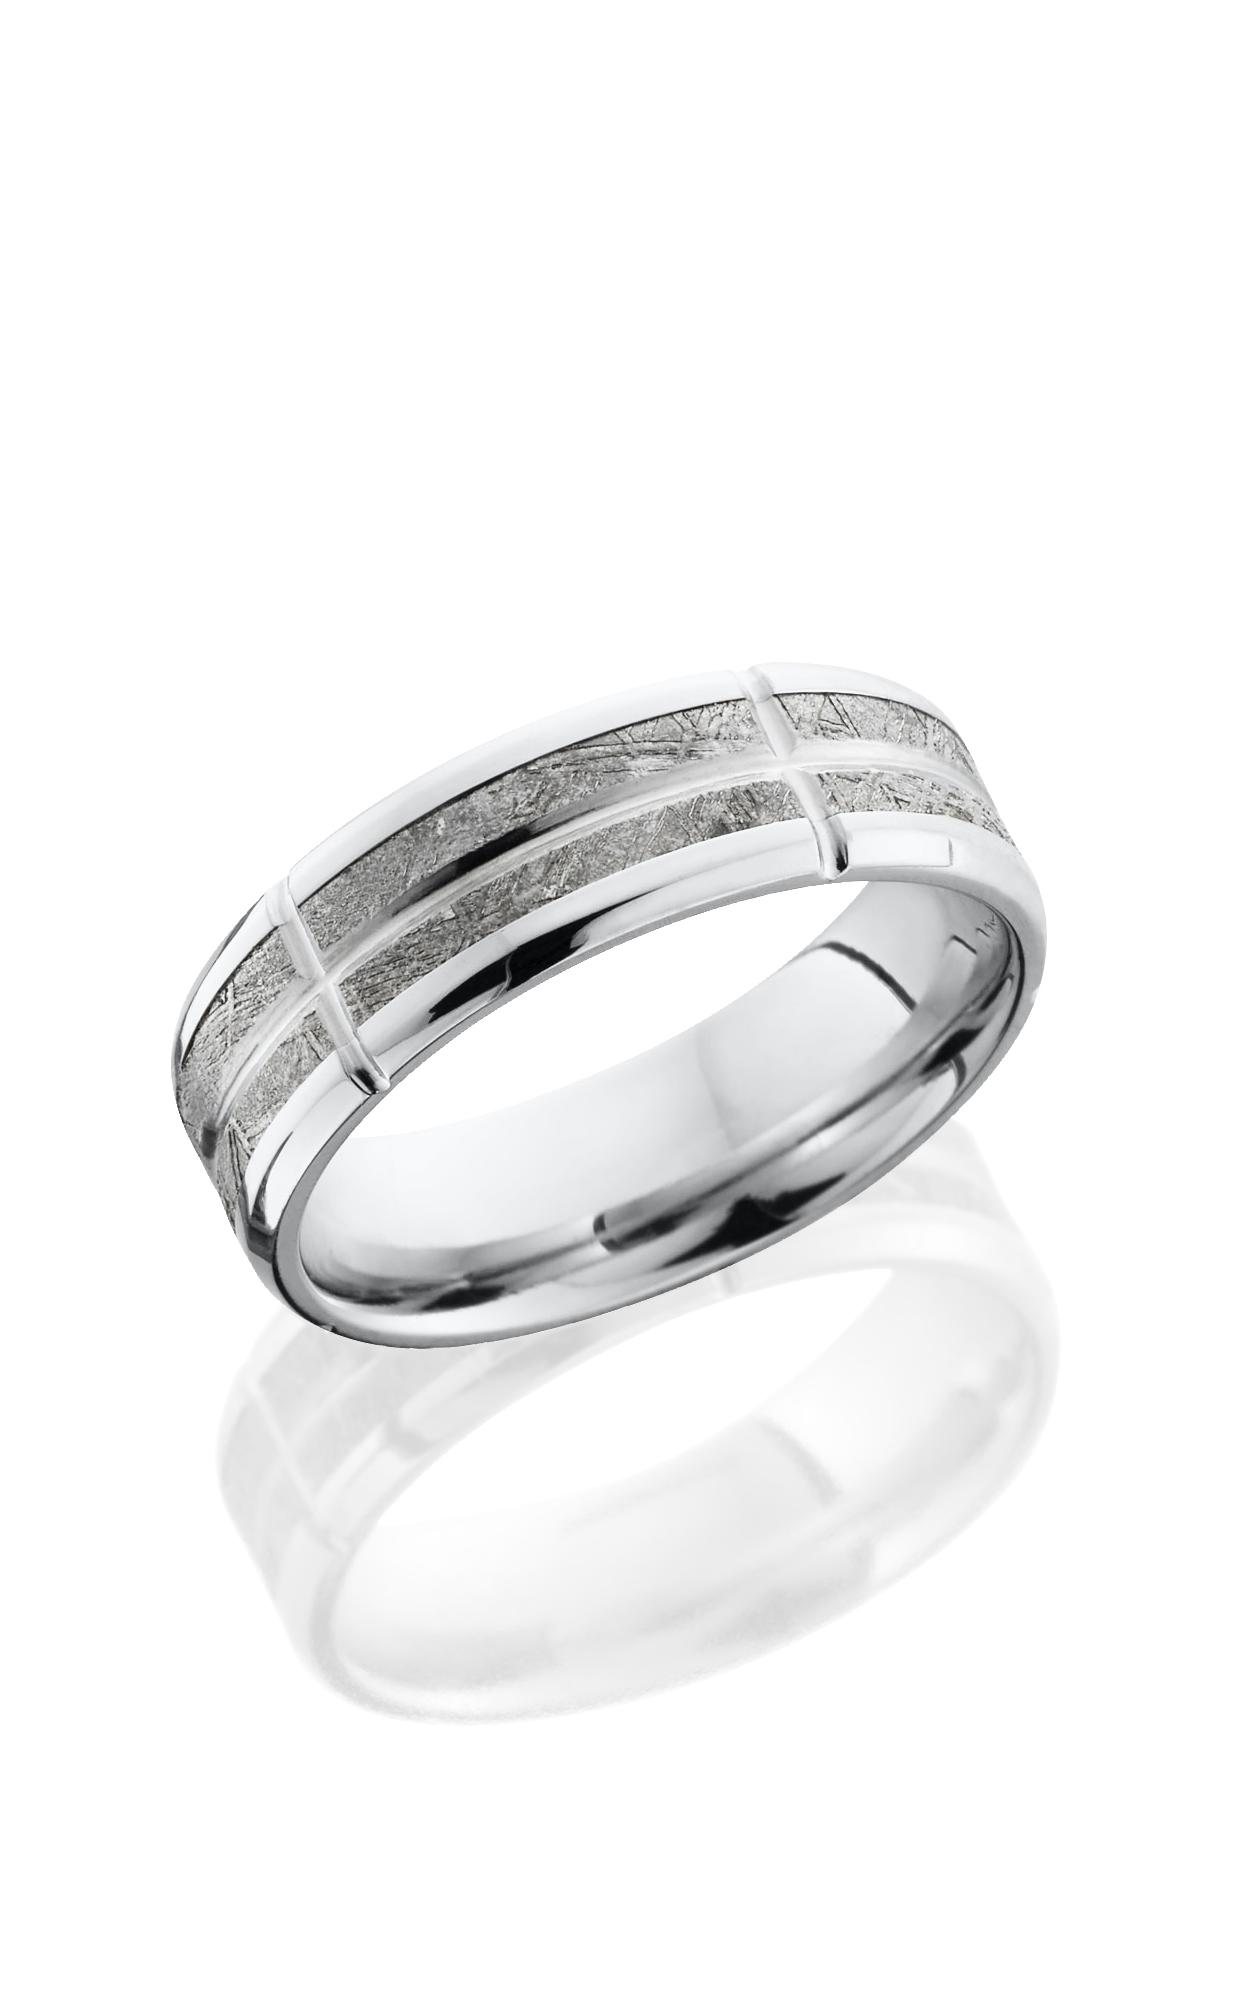 Lashbrook Precious Metals 90061 product image